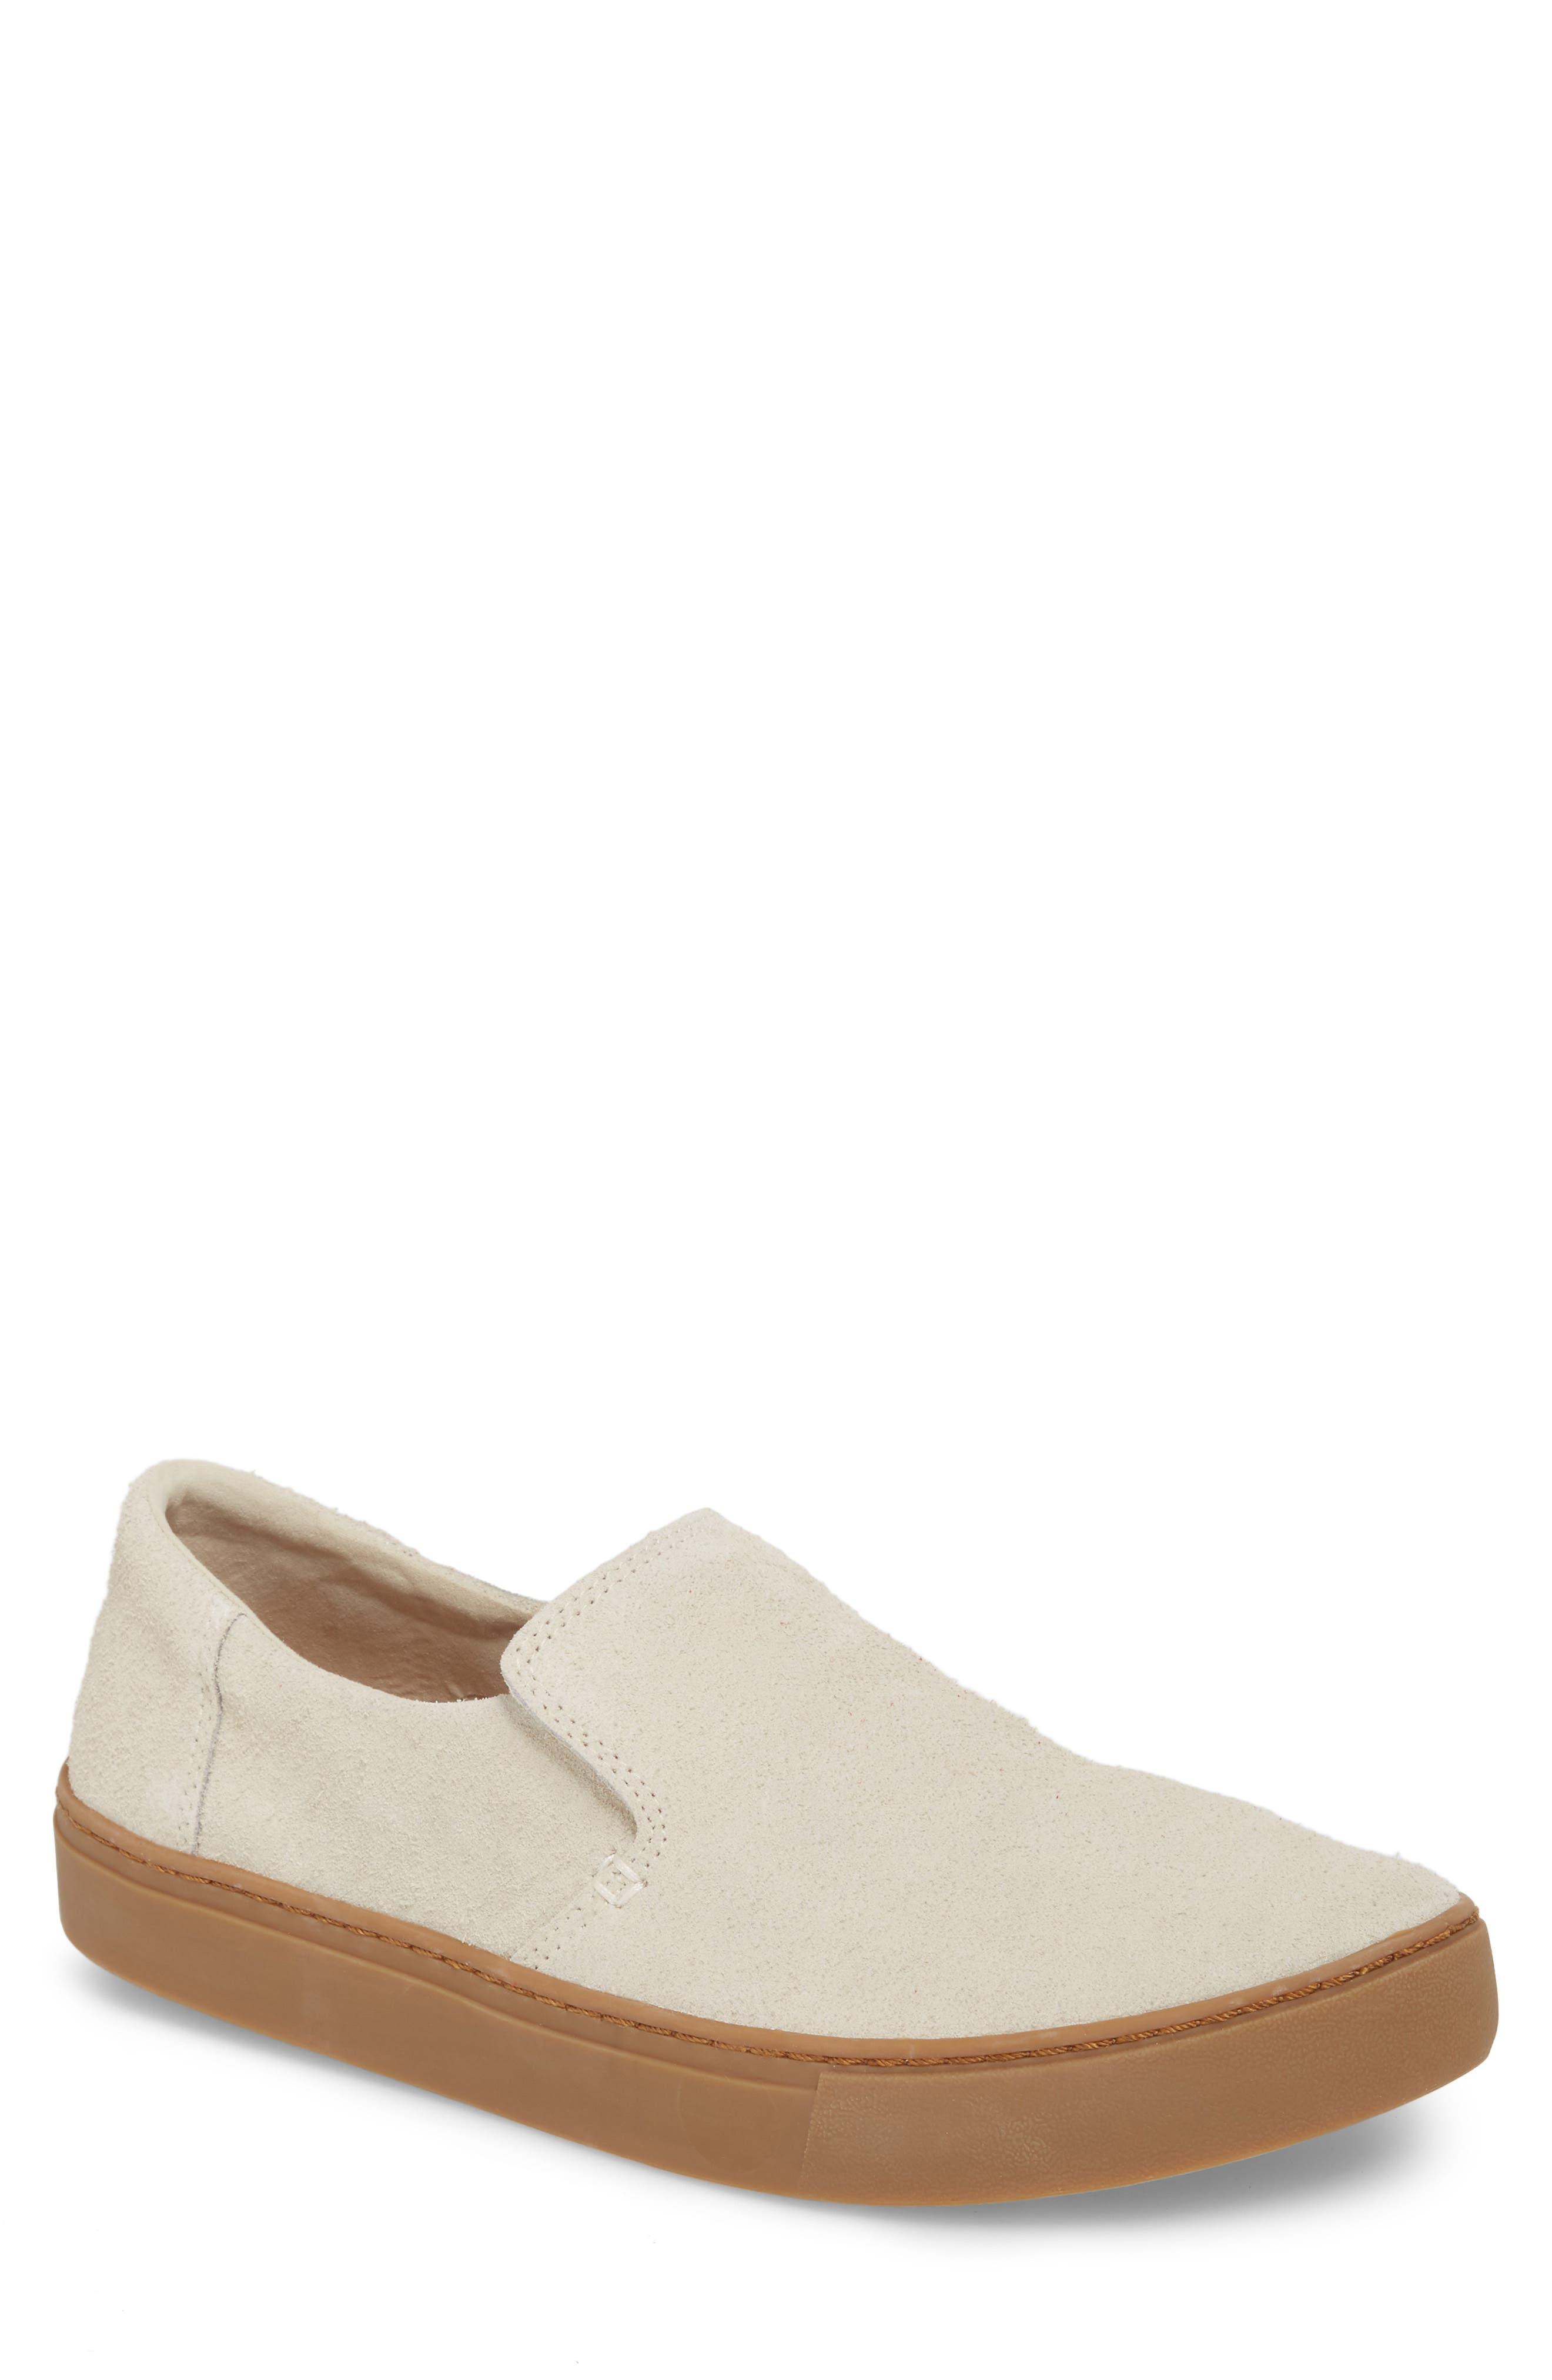 Loma Slip-On Sneaker,                         Main,                         color, 250